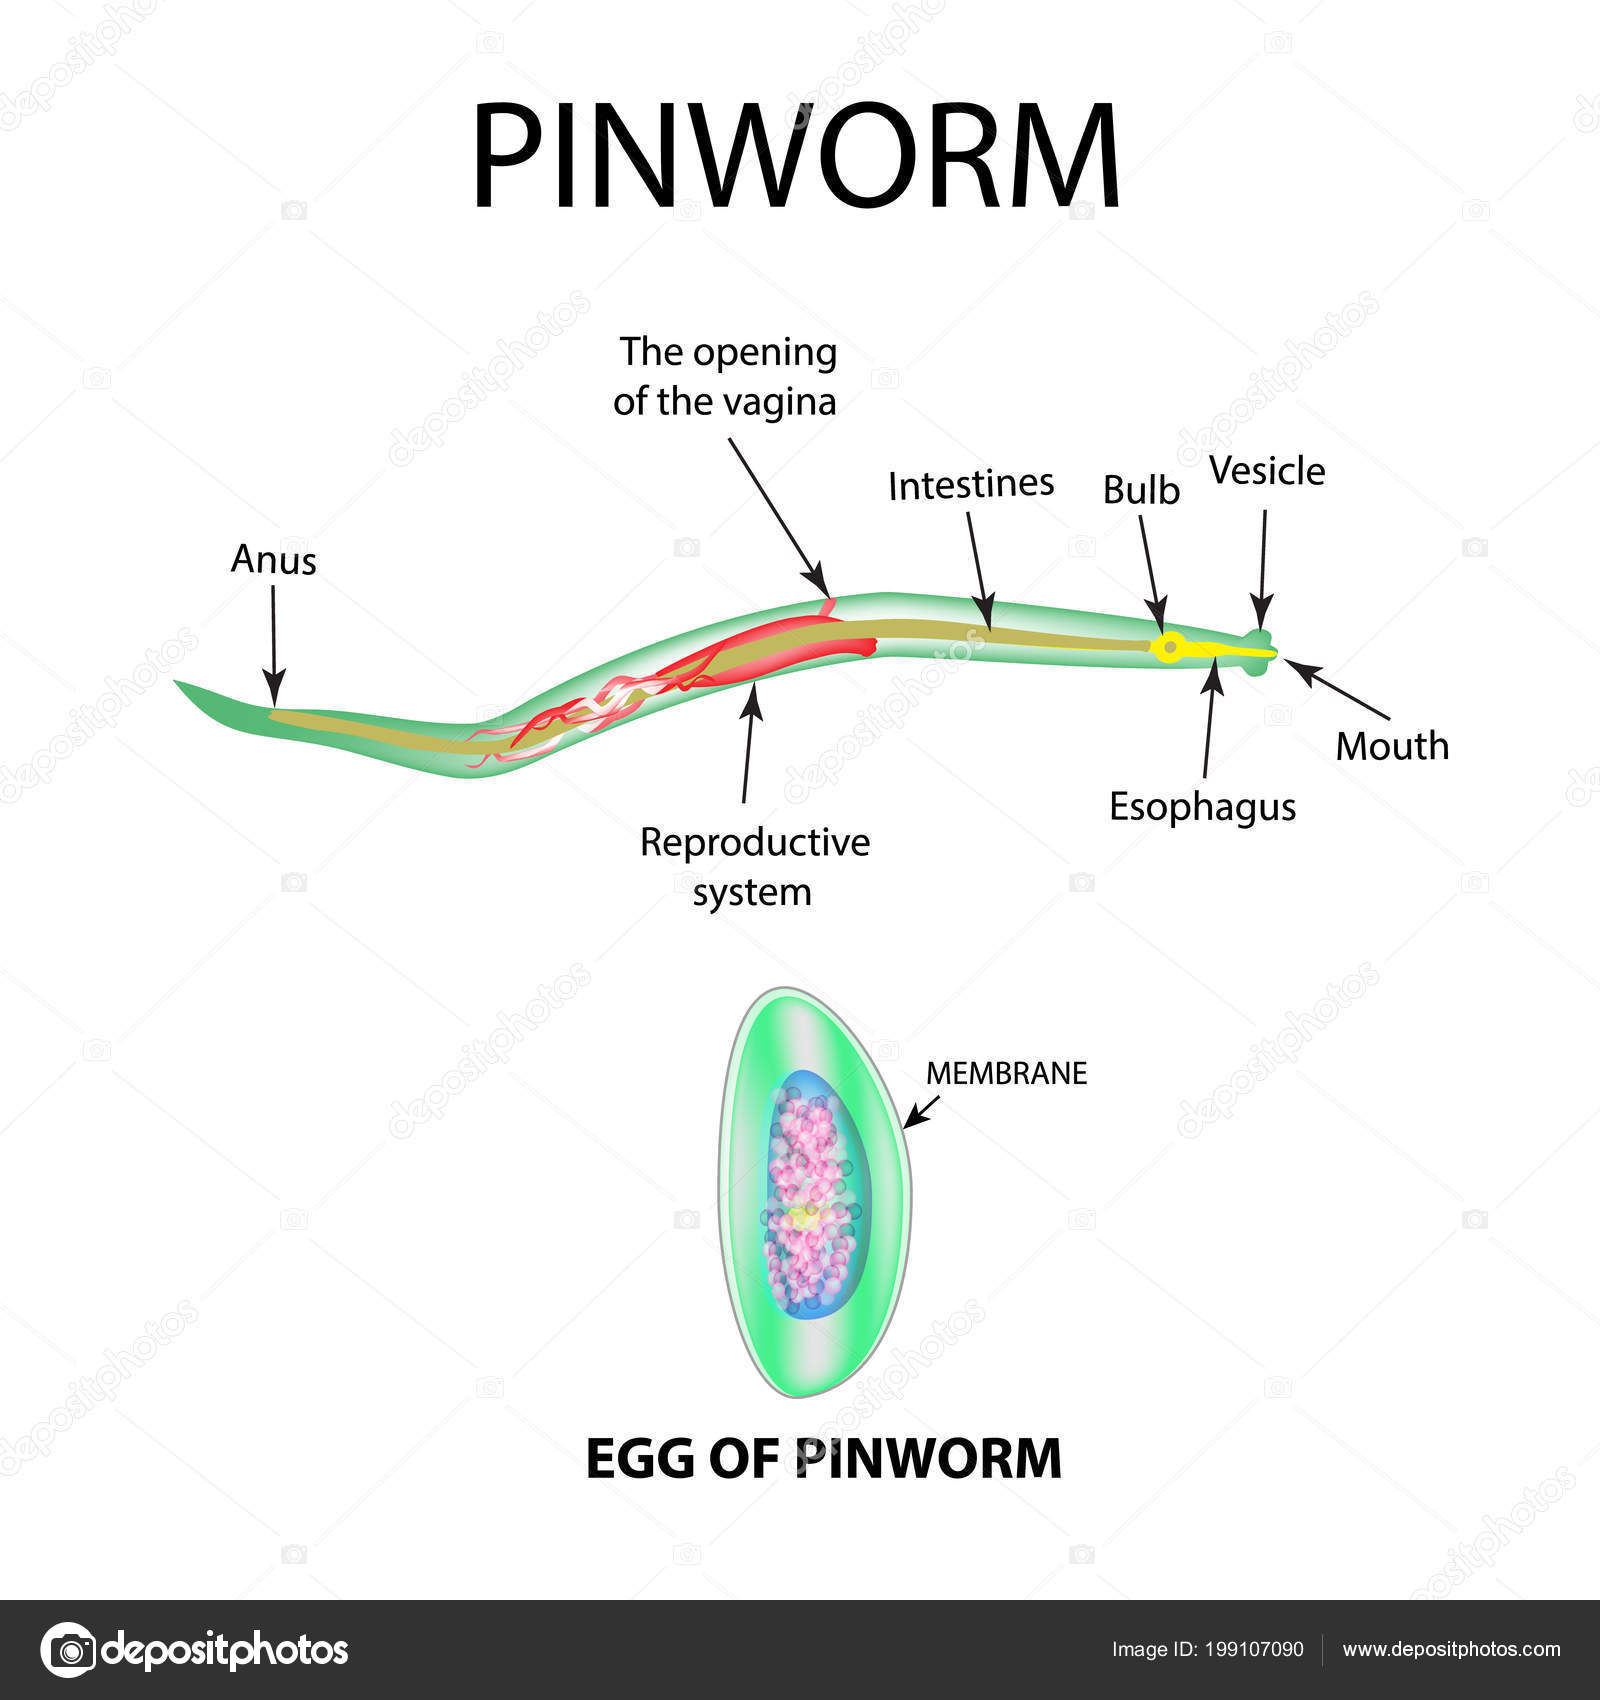 Pinworm fejlesztési ciklusdiagram. Giardia u psa liecba